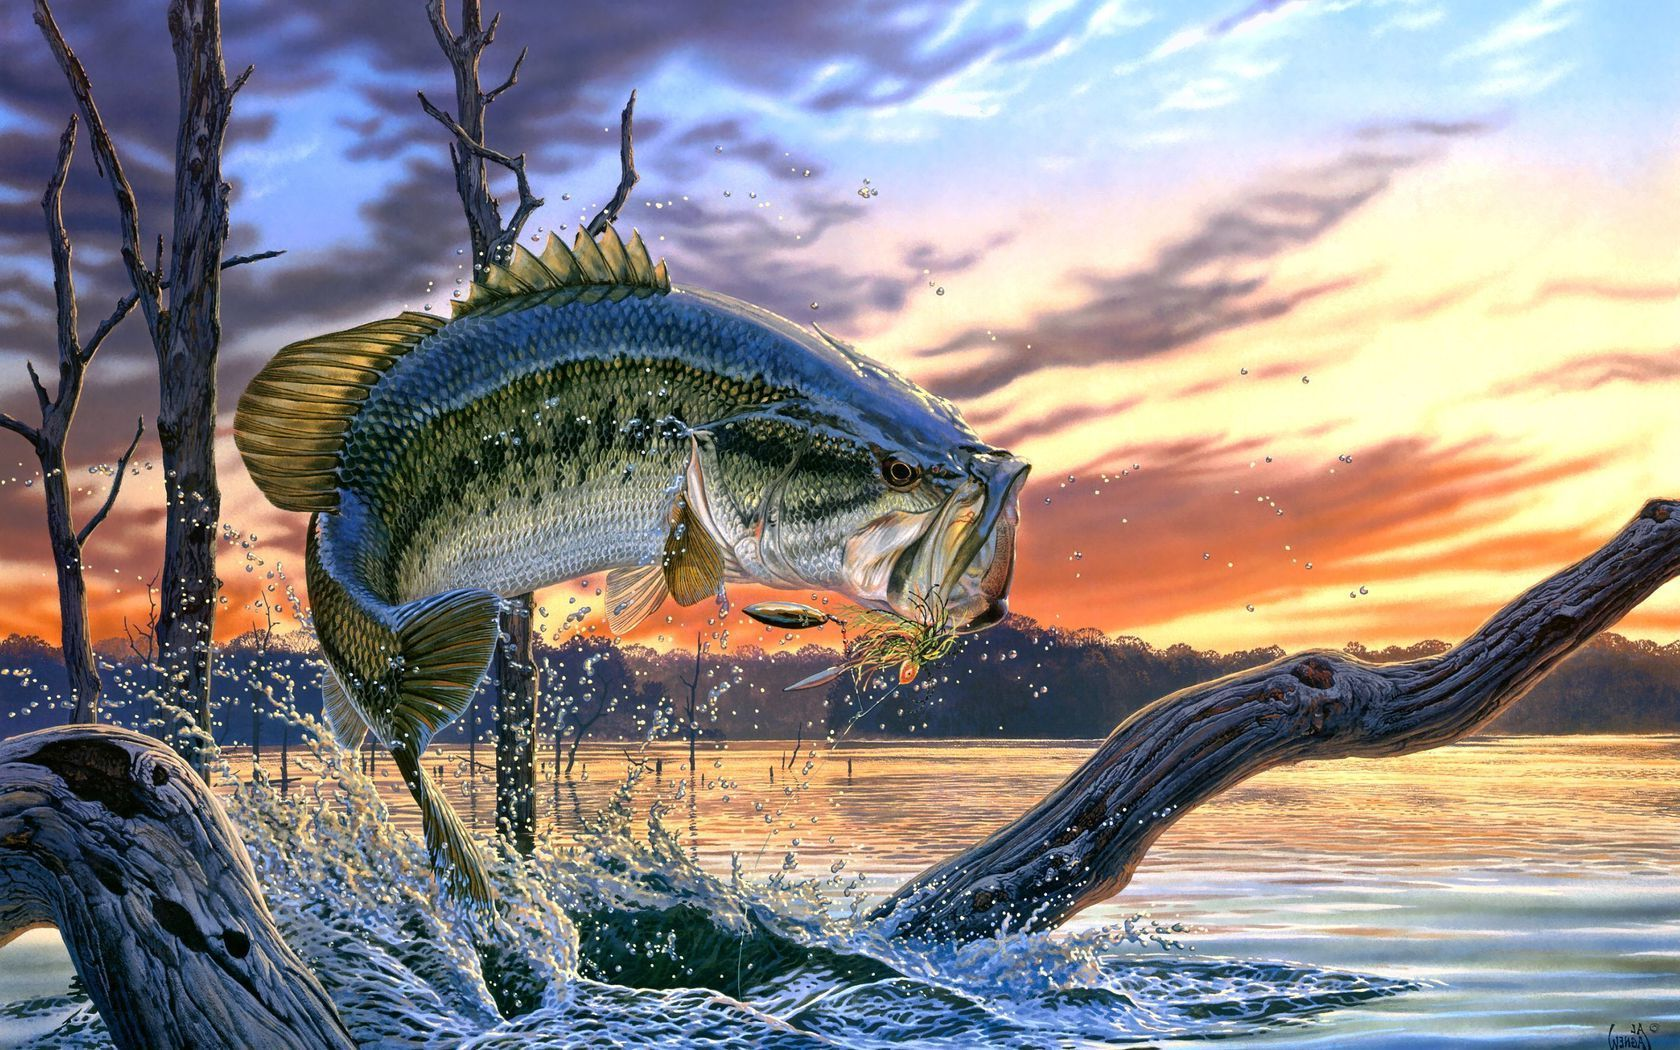 Bass Fishing Wallpaper Backgrounds Wallpaper Cave 1680x1050